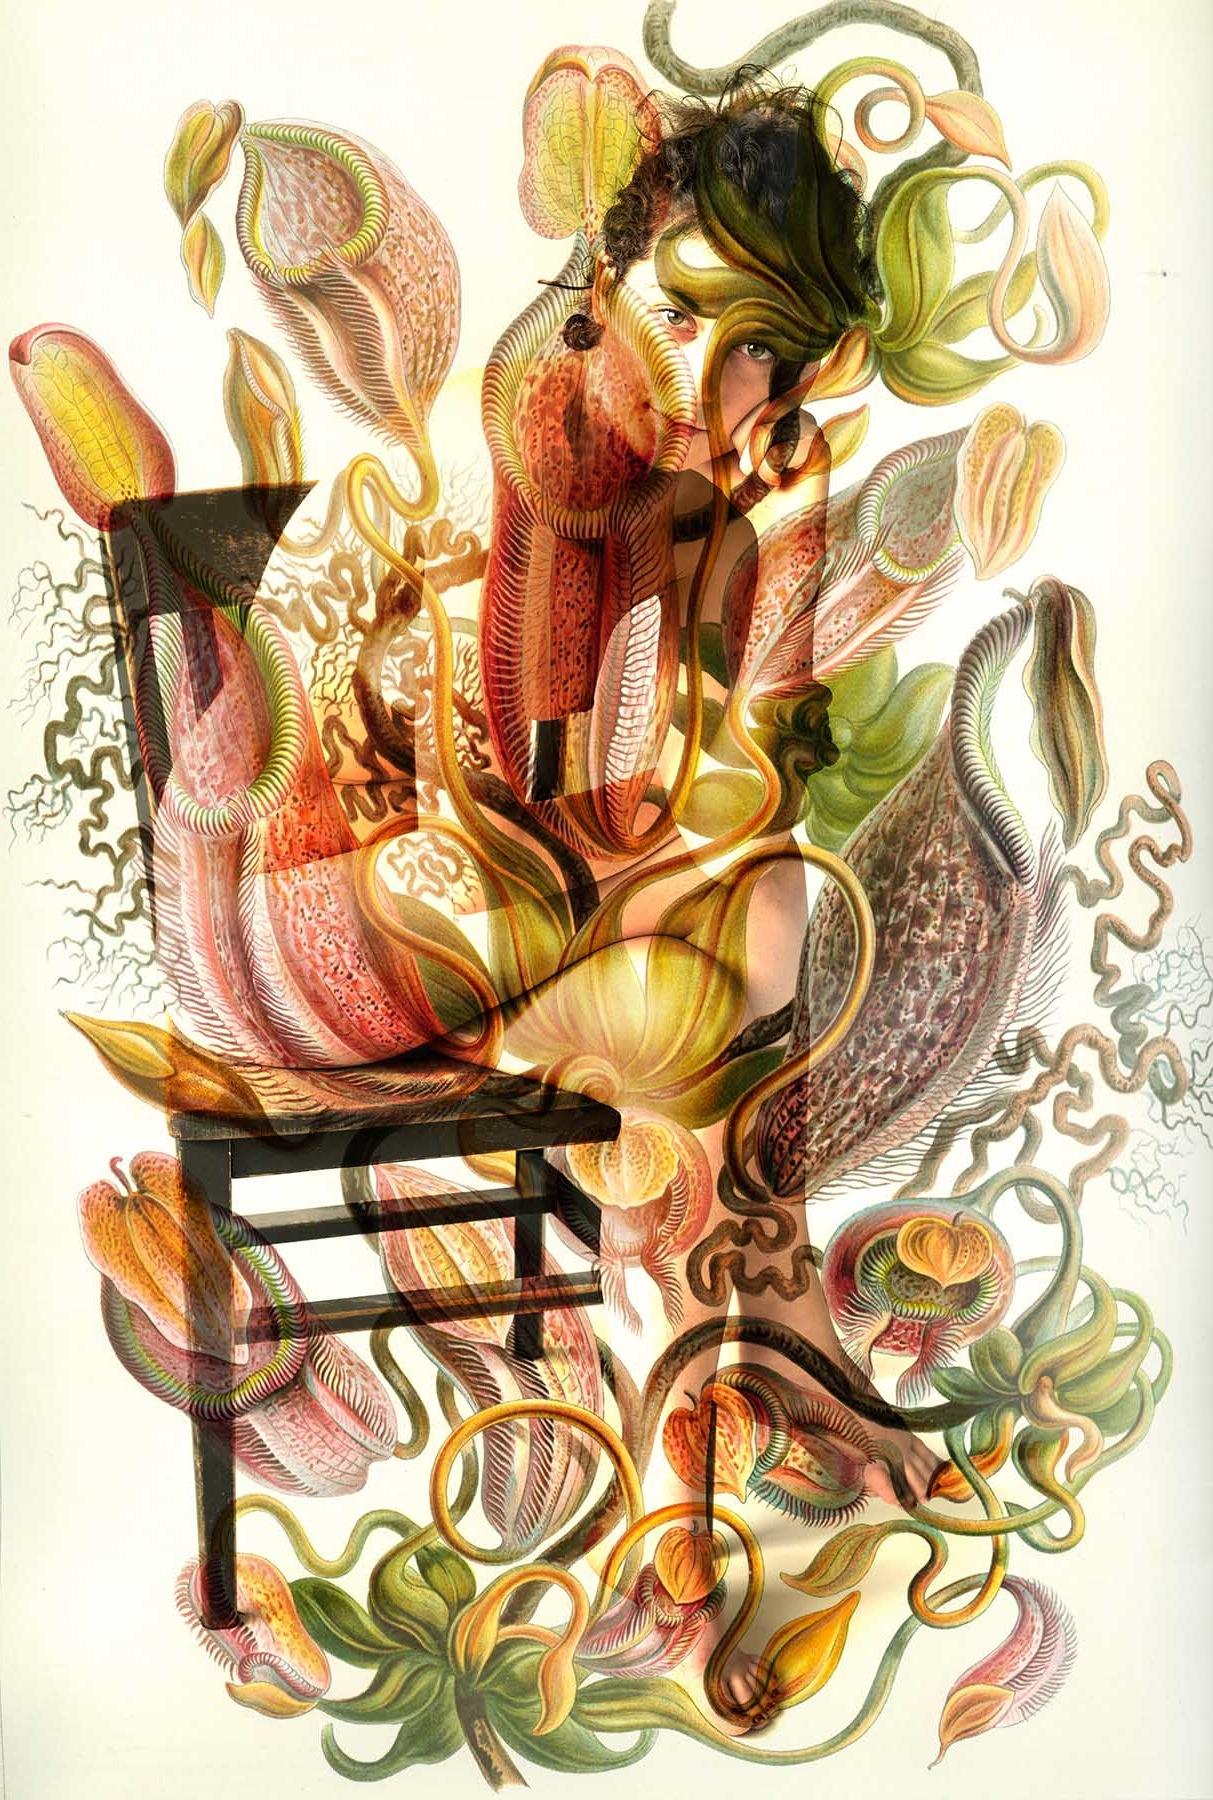 """Nepenthes Melamphora"" illustration by Ernst Haeckel 1899"